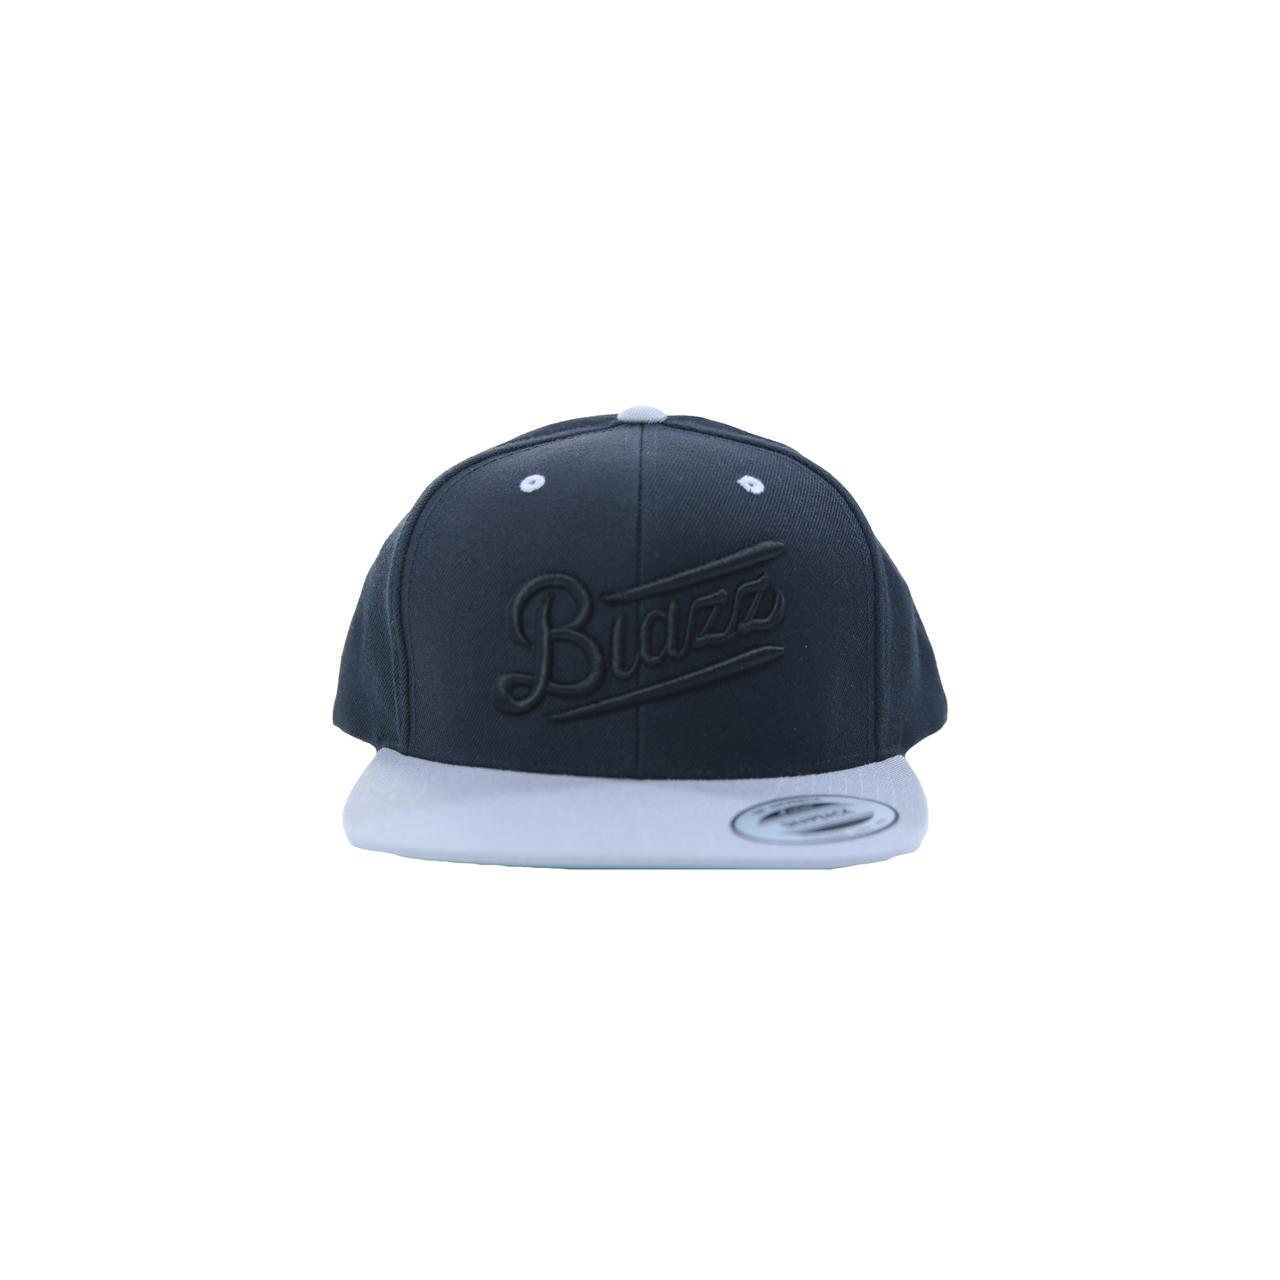 Blunt's Blazz B.B CAP 2021 [BLACK / GRAY]